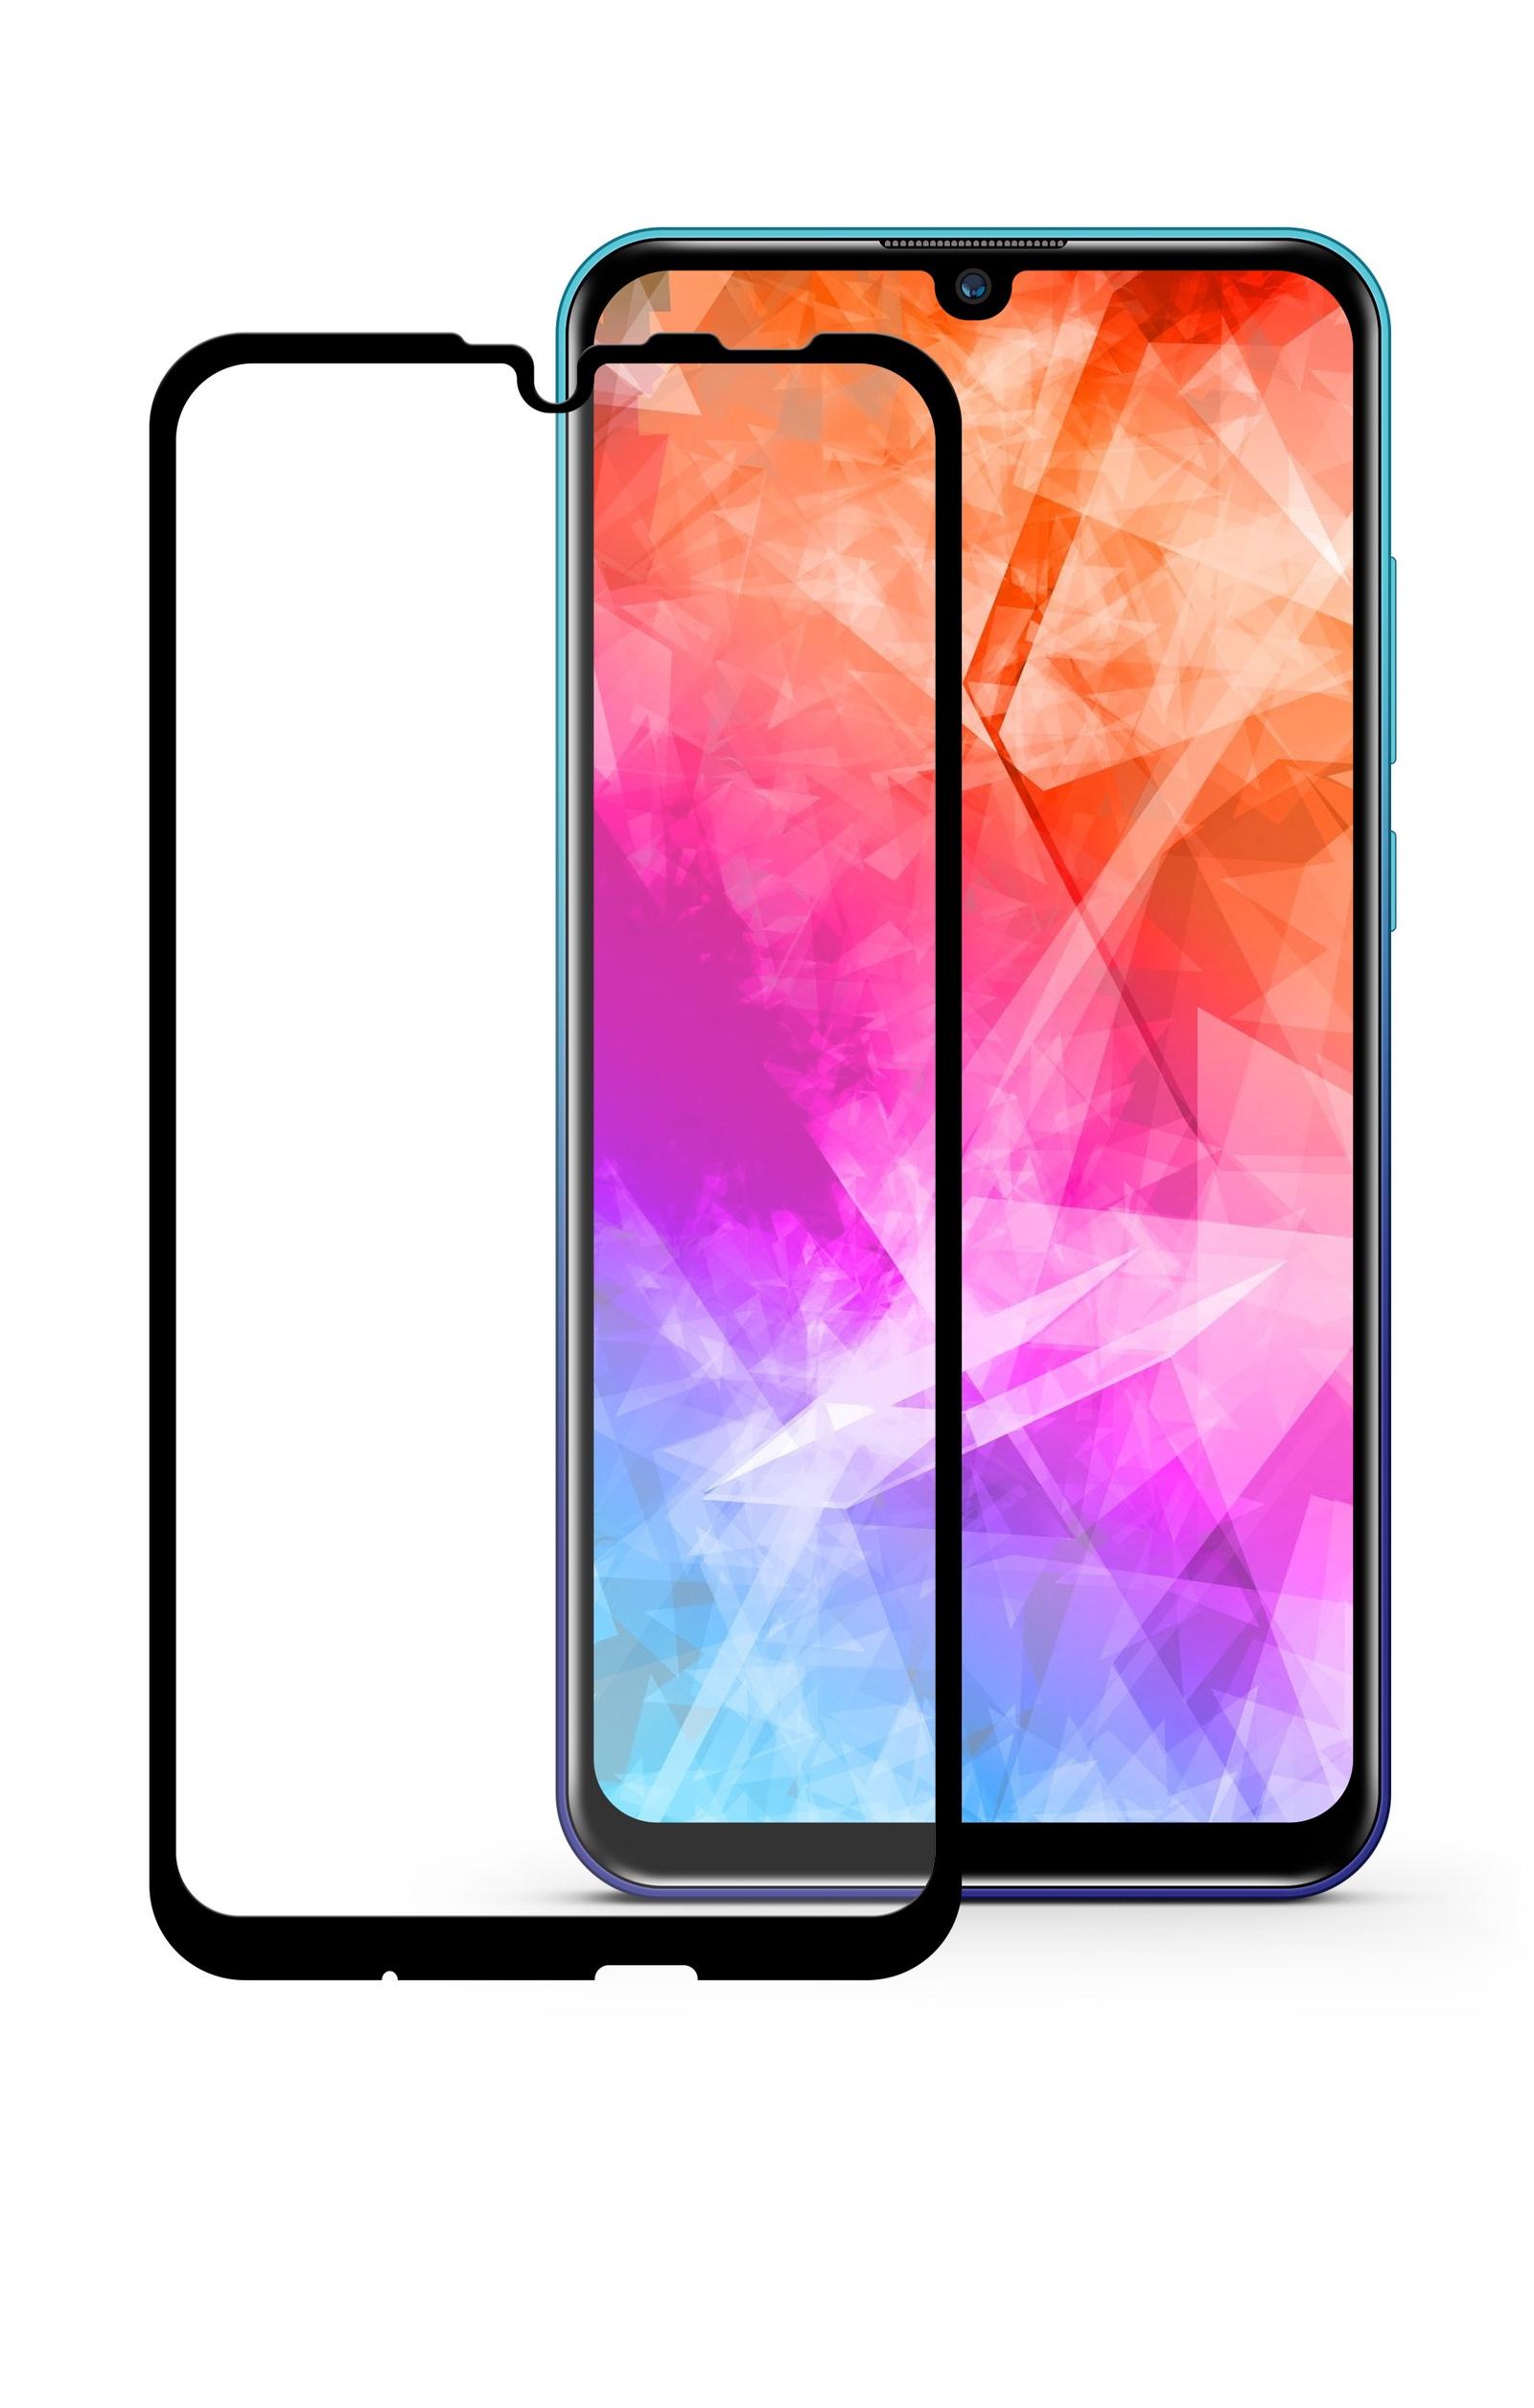 Защитное стекло Mobius Huawei Honor 10 Lite/P Smart 2019, черный аксессуар защитное стекло для huawei p smart pero 2 5d white prmg hpsw